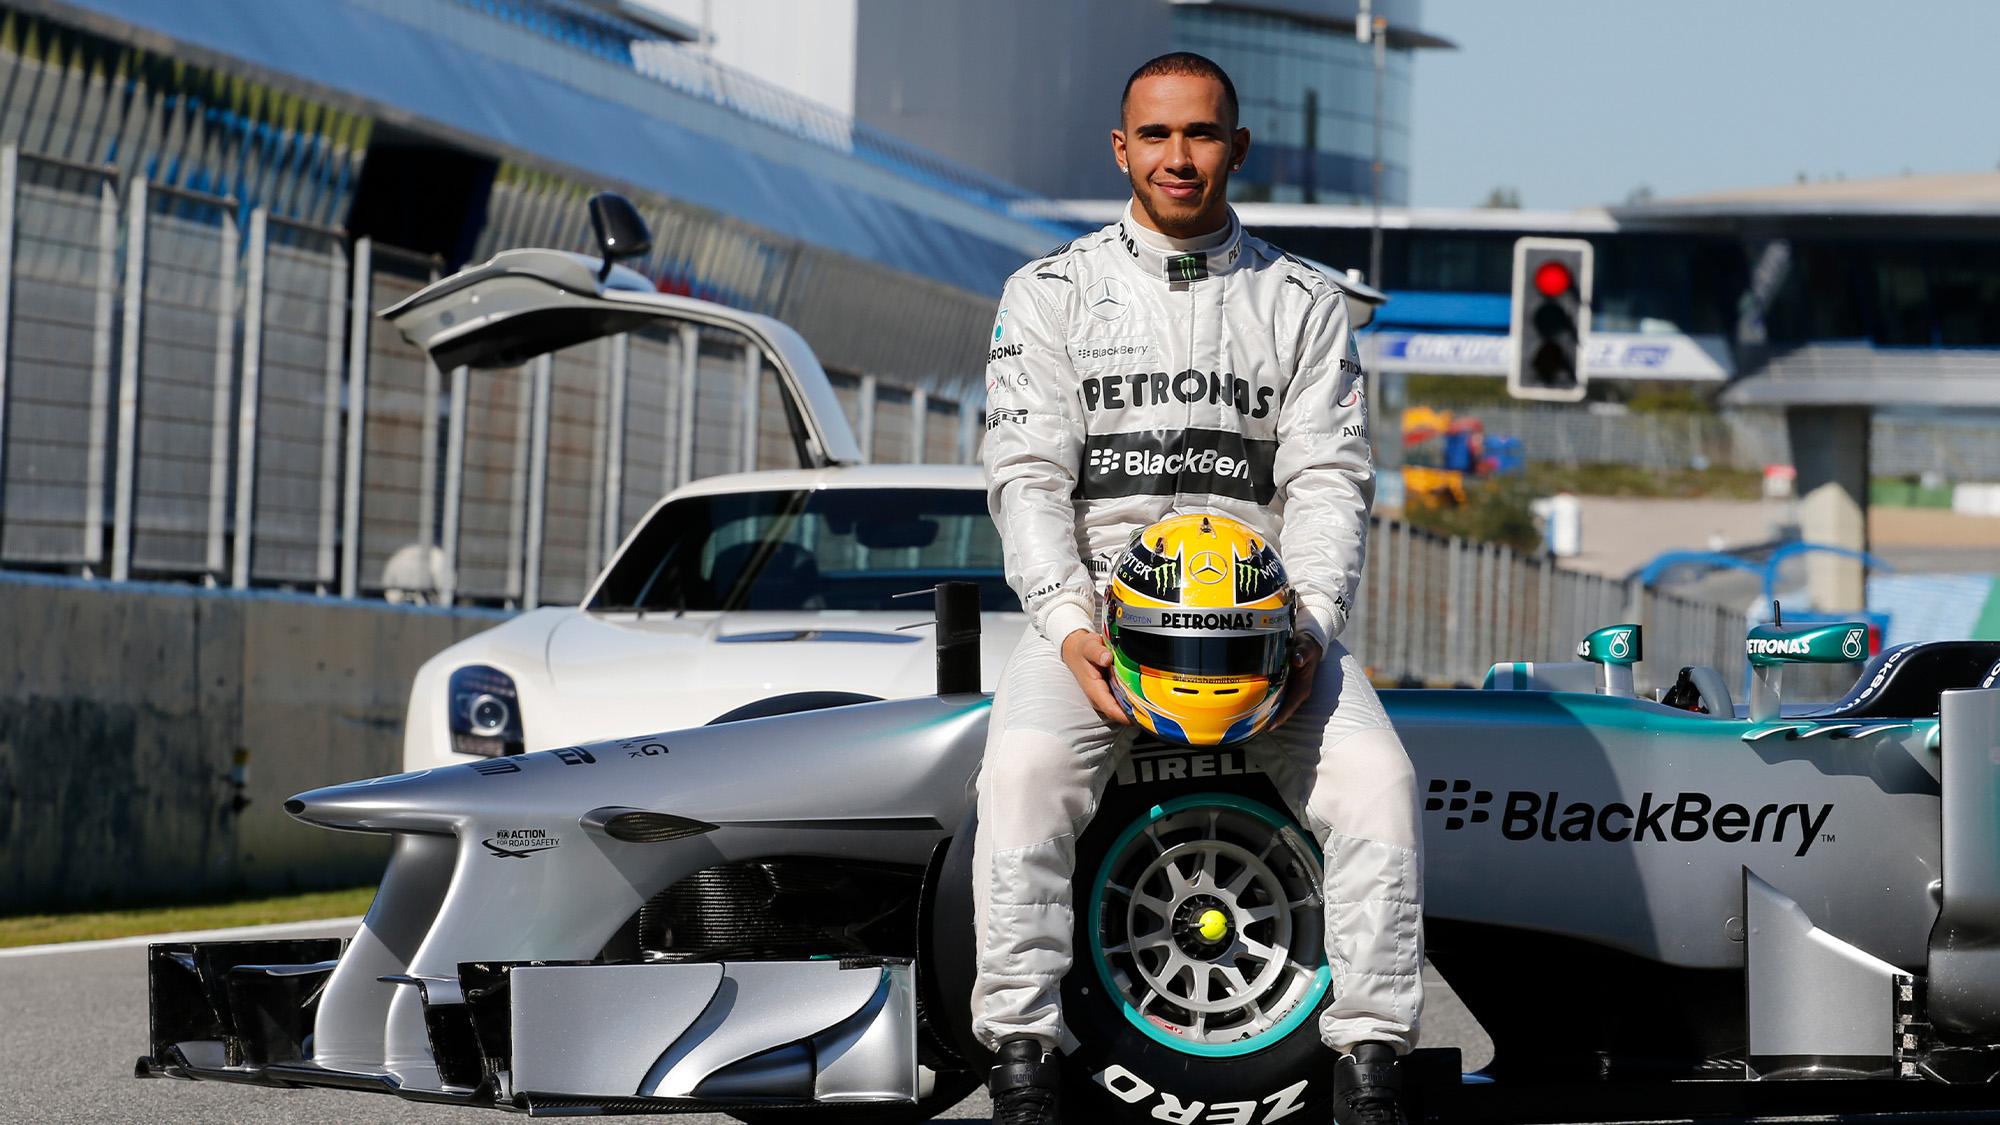 Lewis Hamilton sits on the Mercedes W04 2013 F1 car